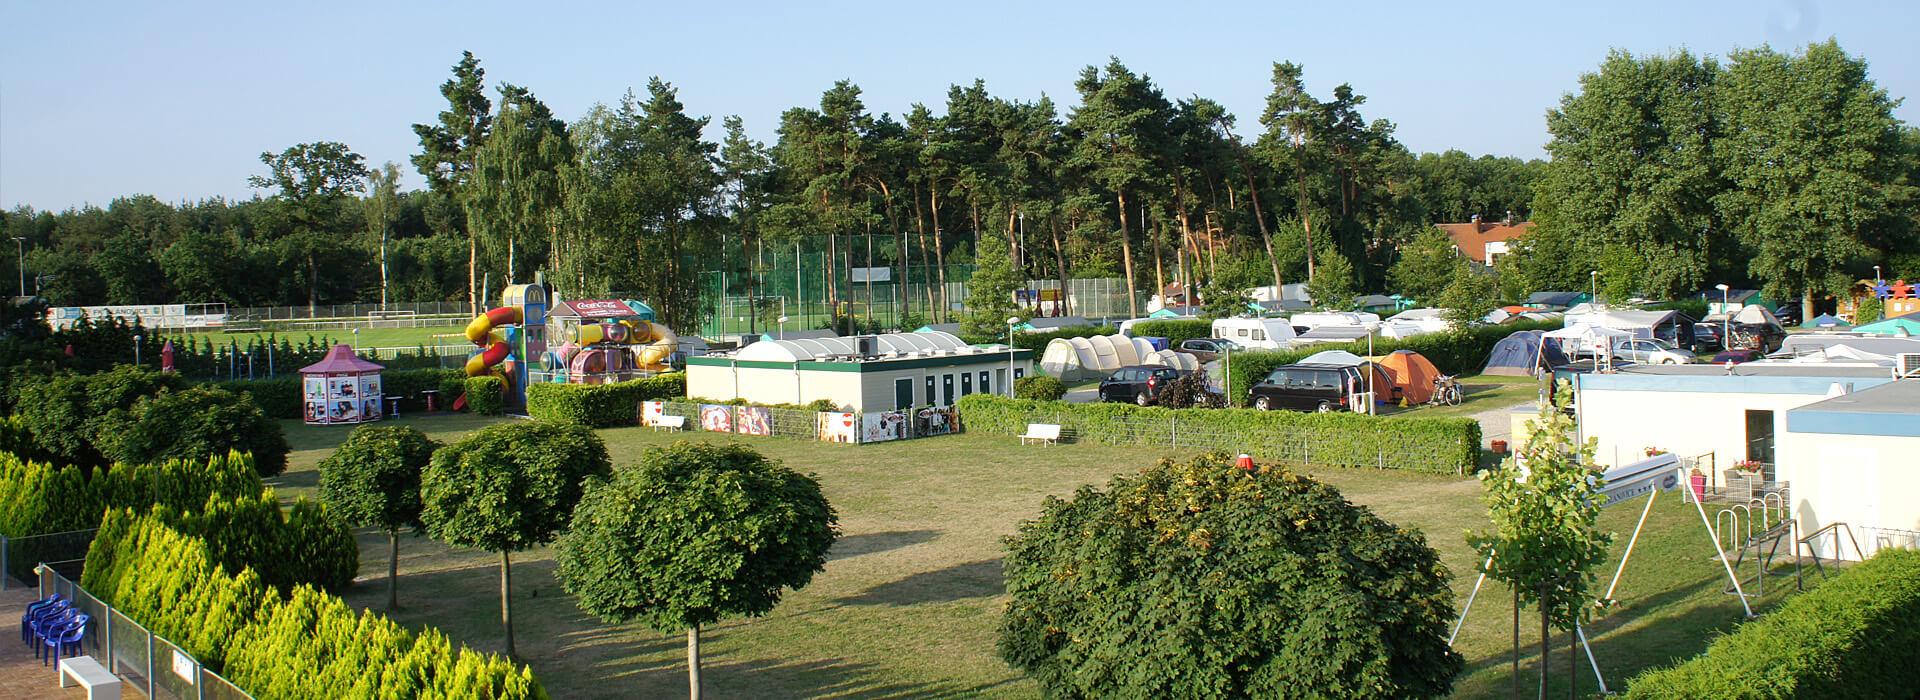 Camping Praha Klánovice